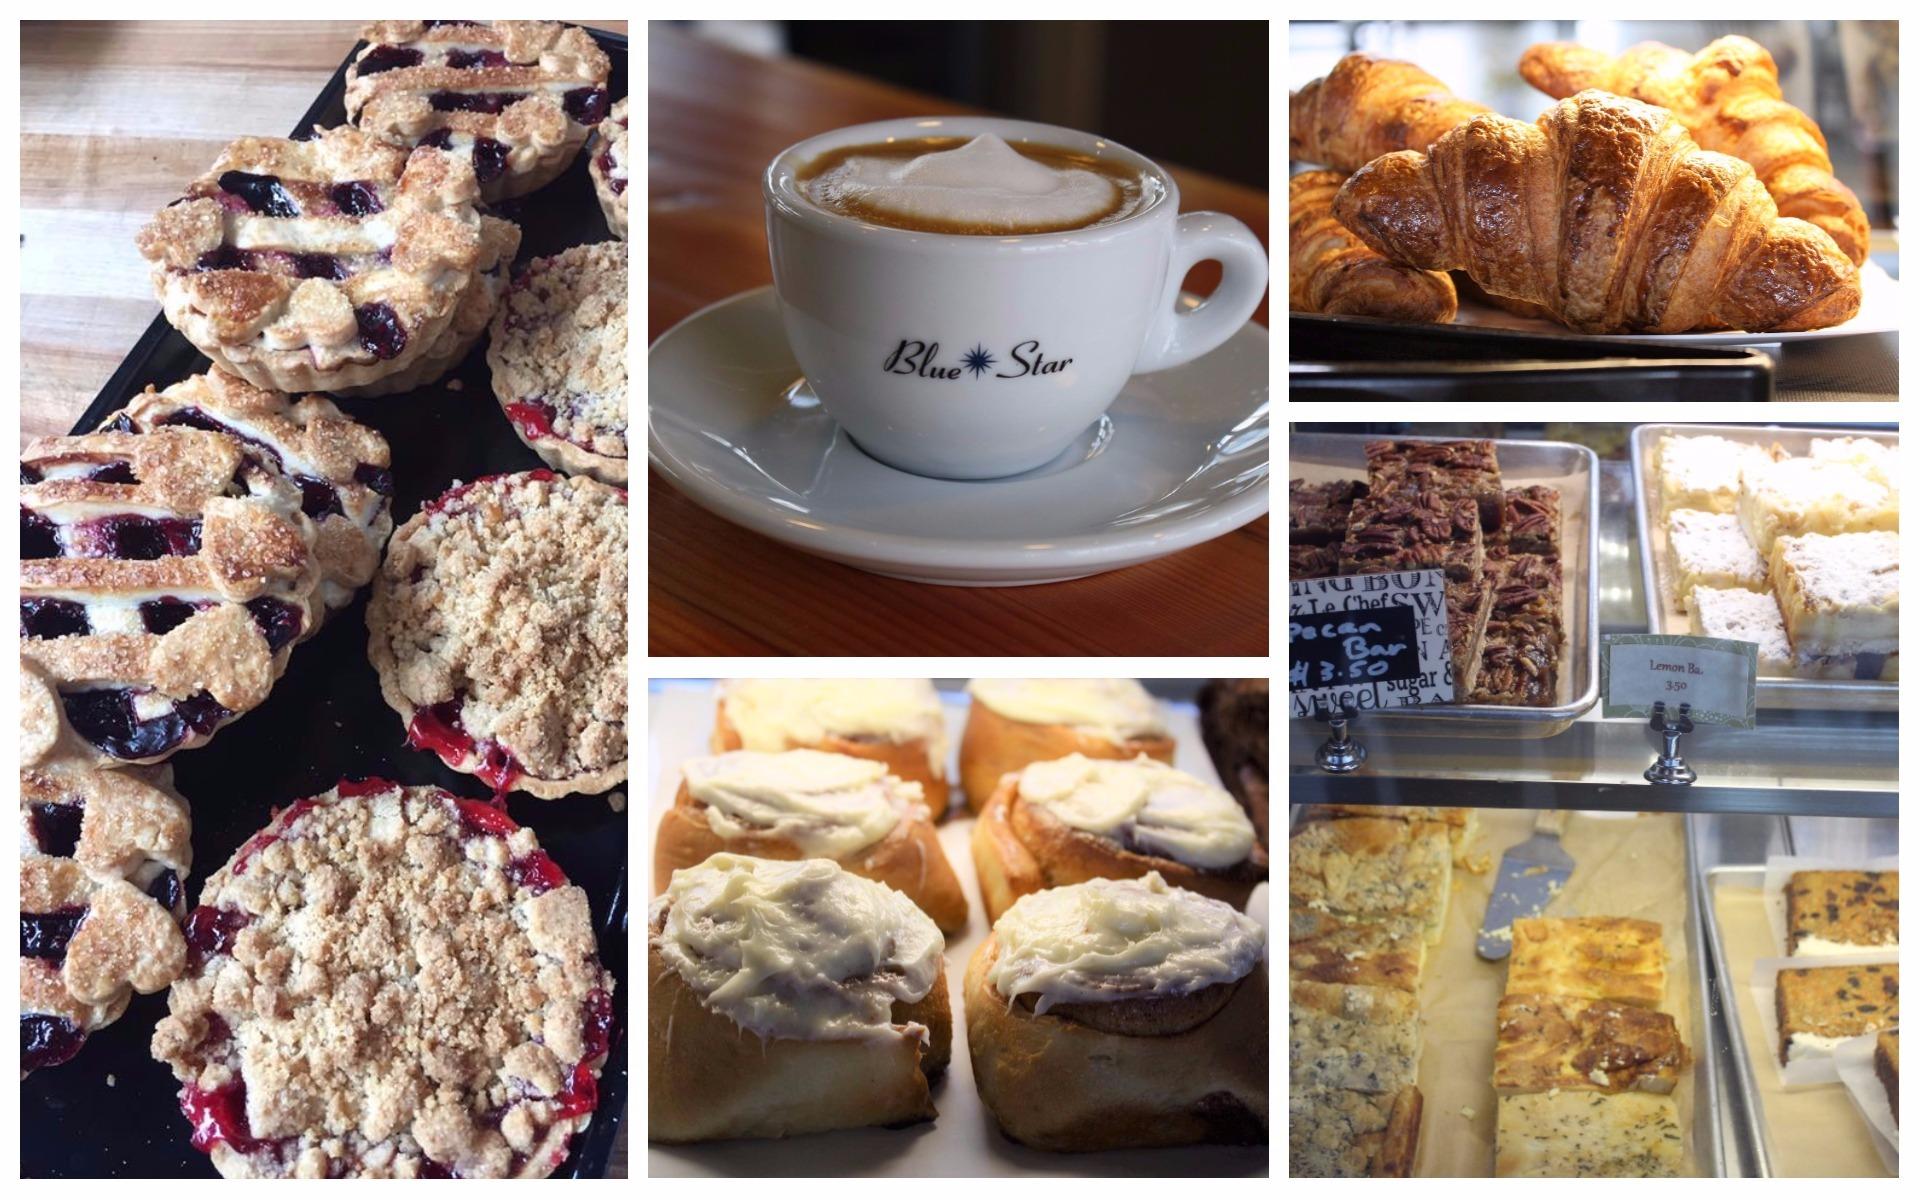 photo credit: Cafe Columbia Facebook